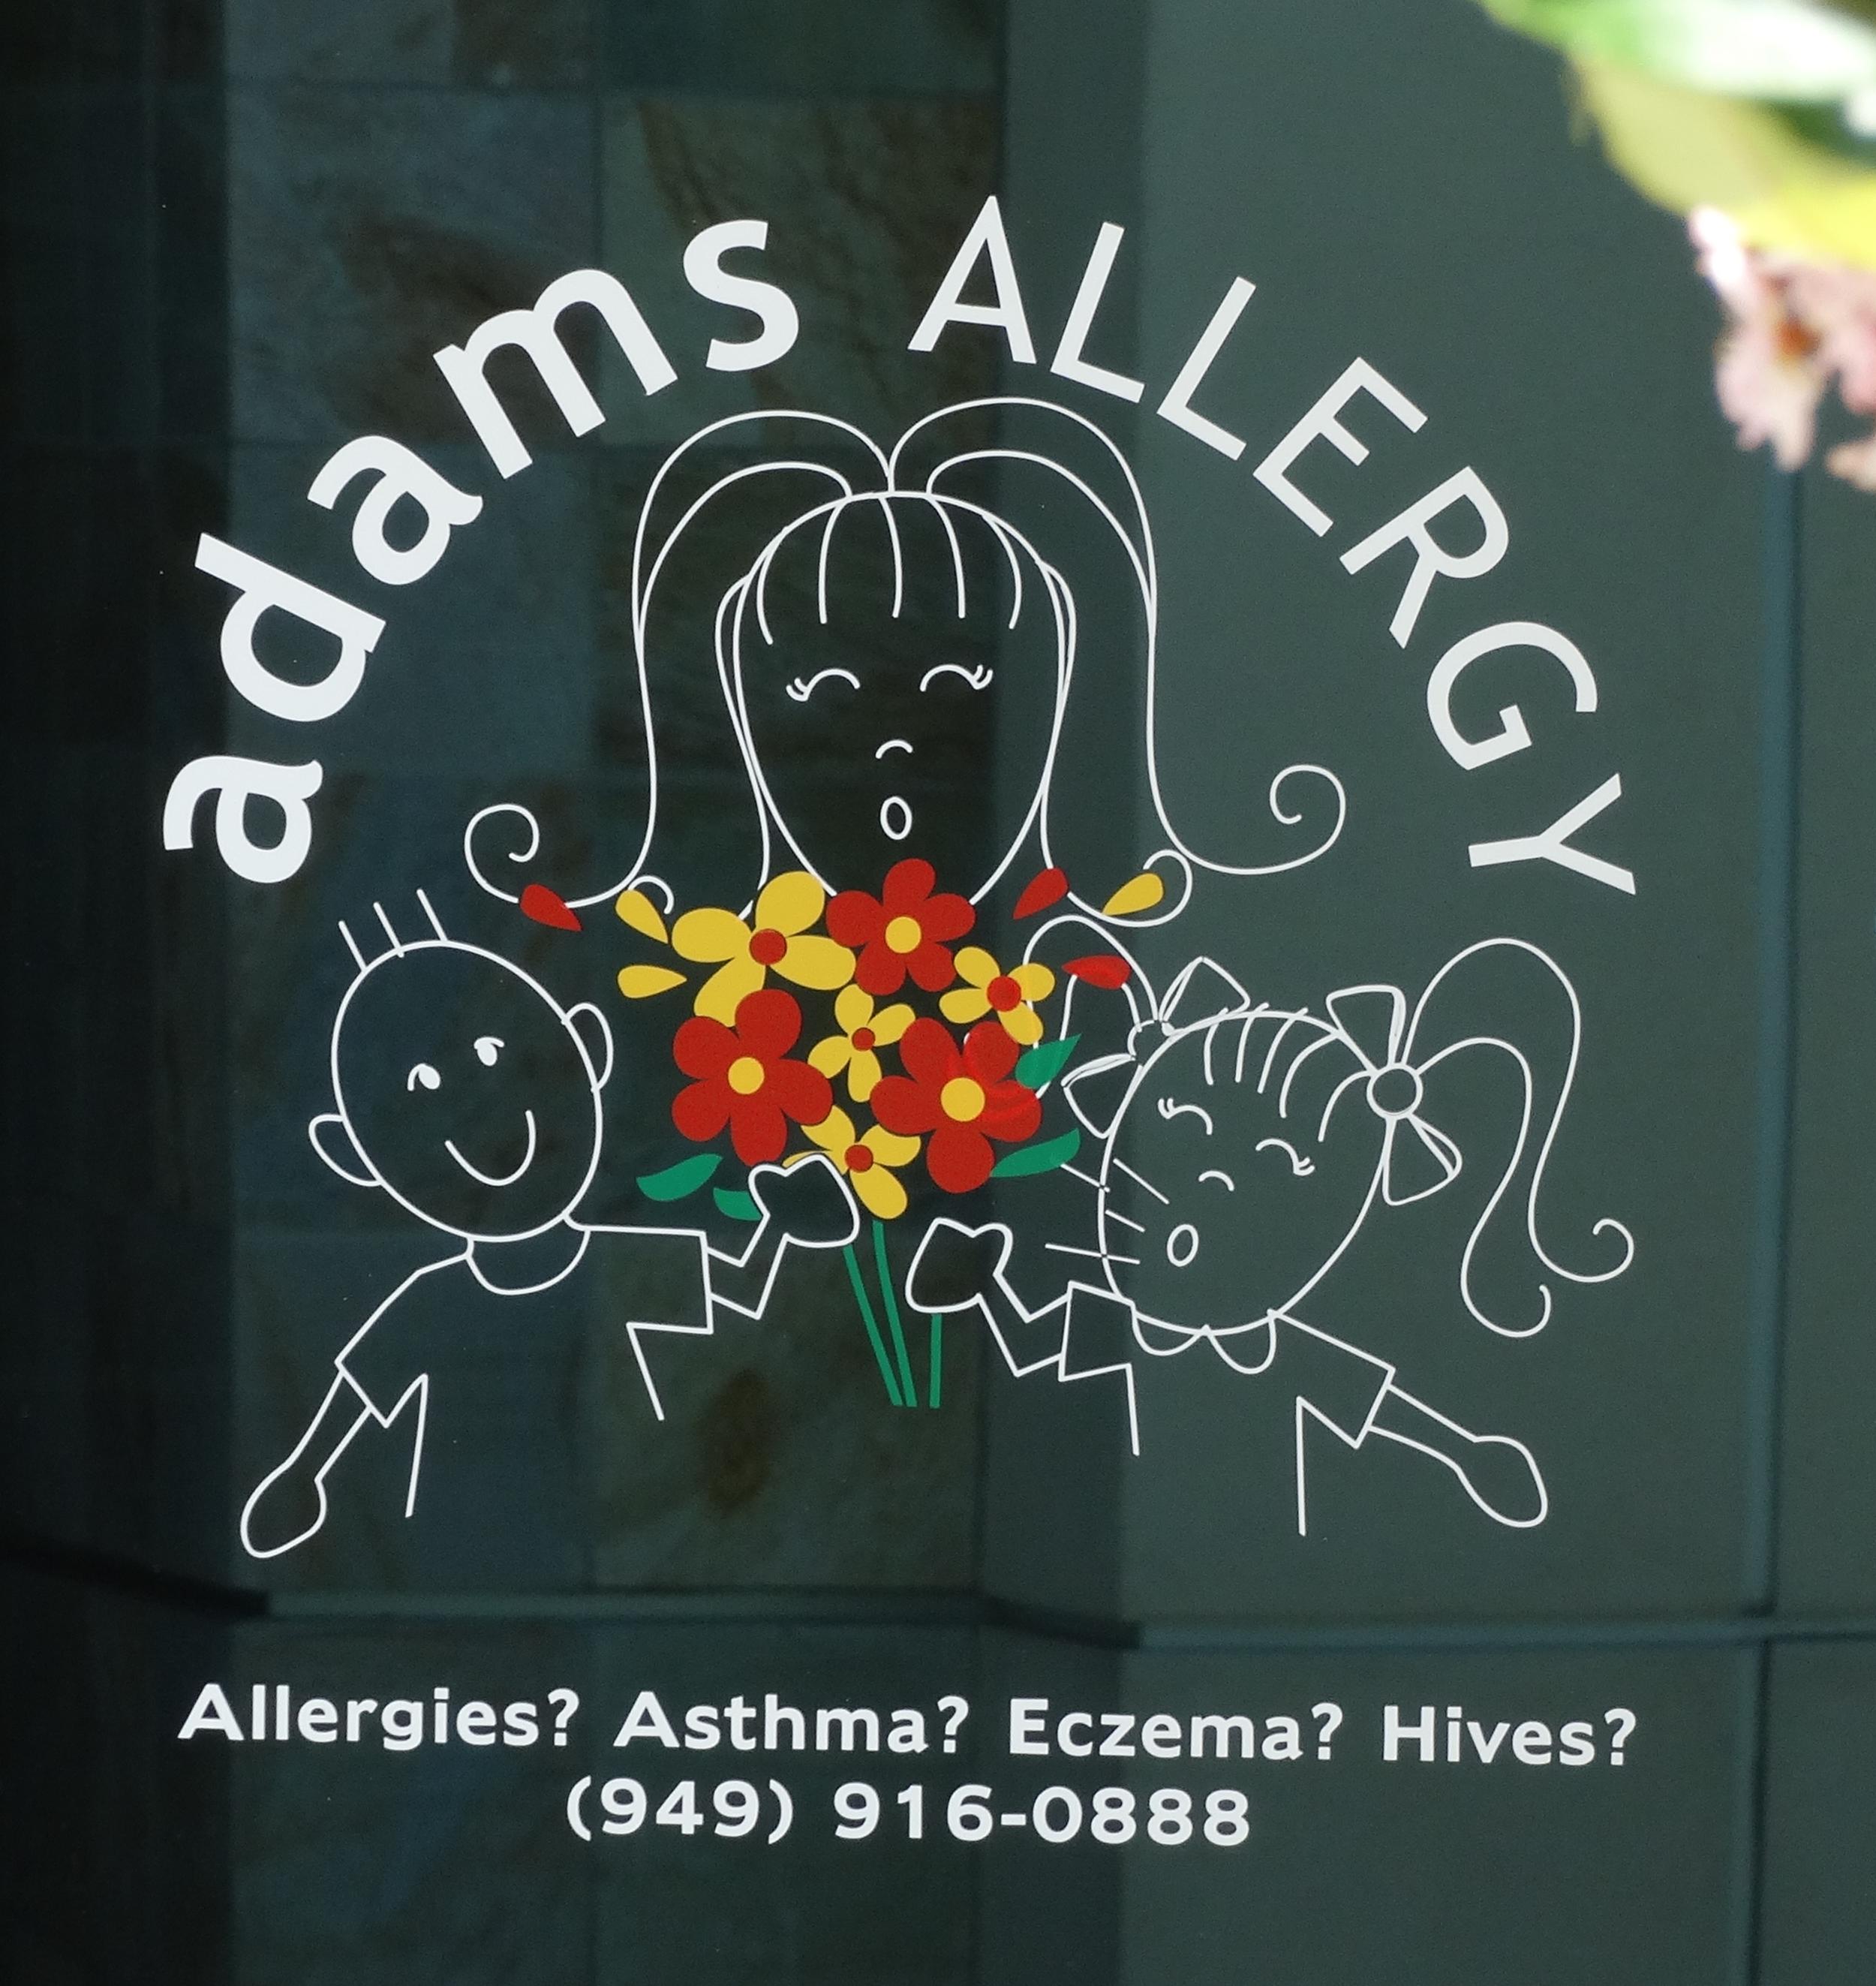 Adams Allergy